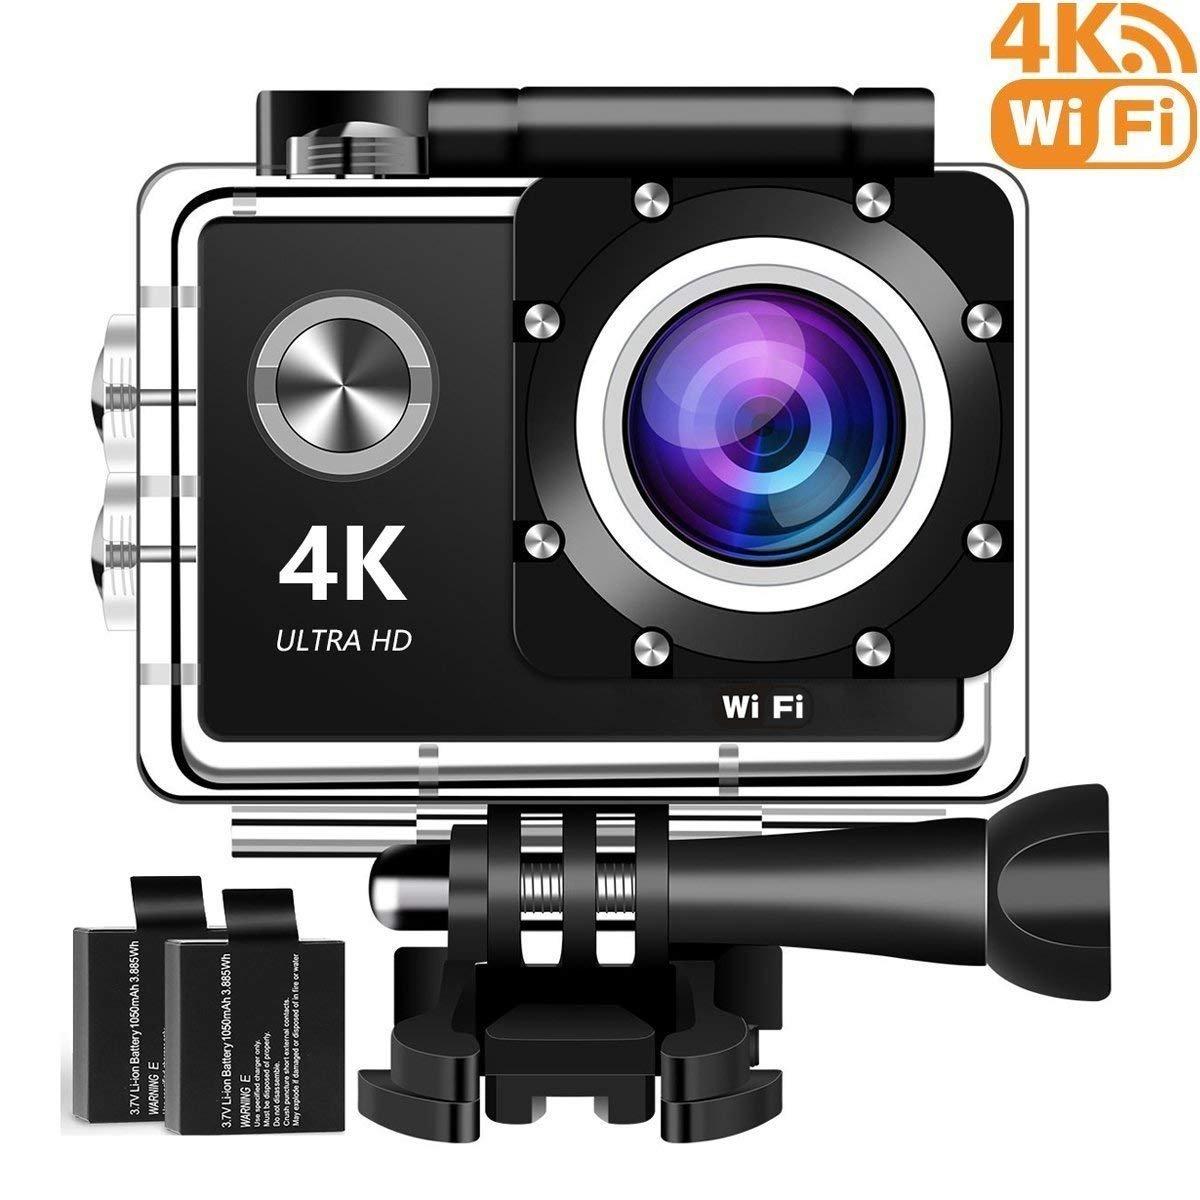 Ganjoy 4K Action Camera Review